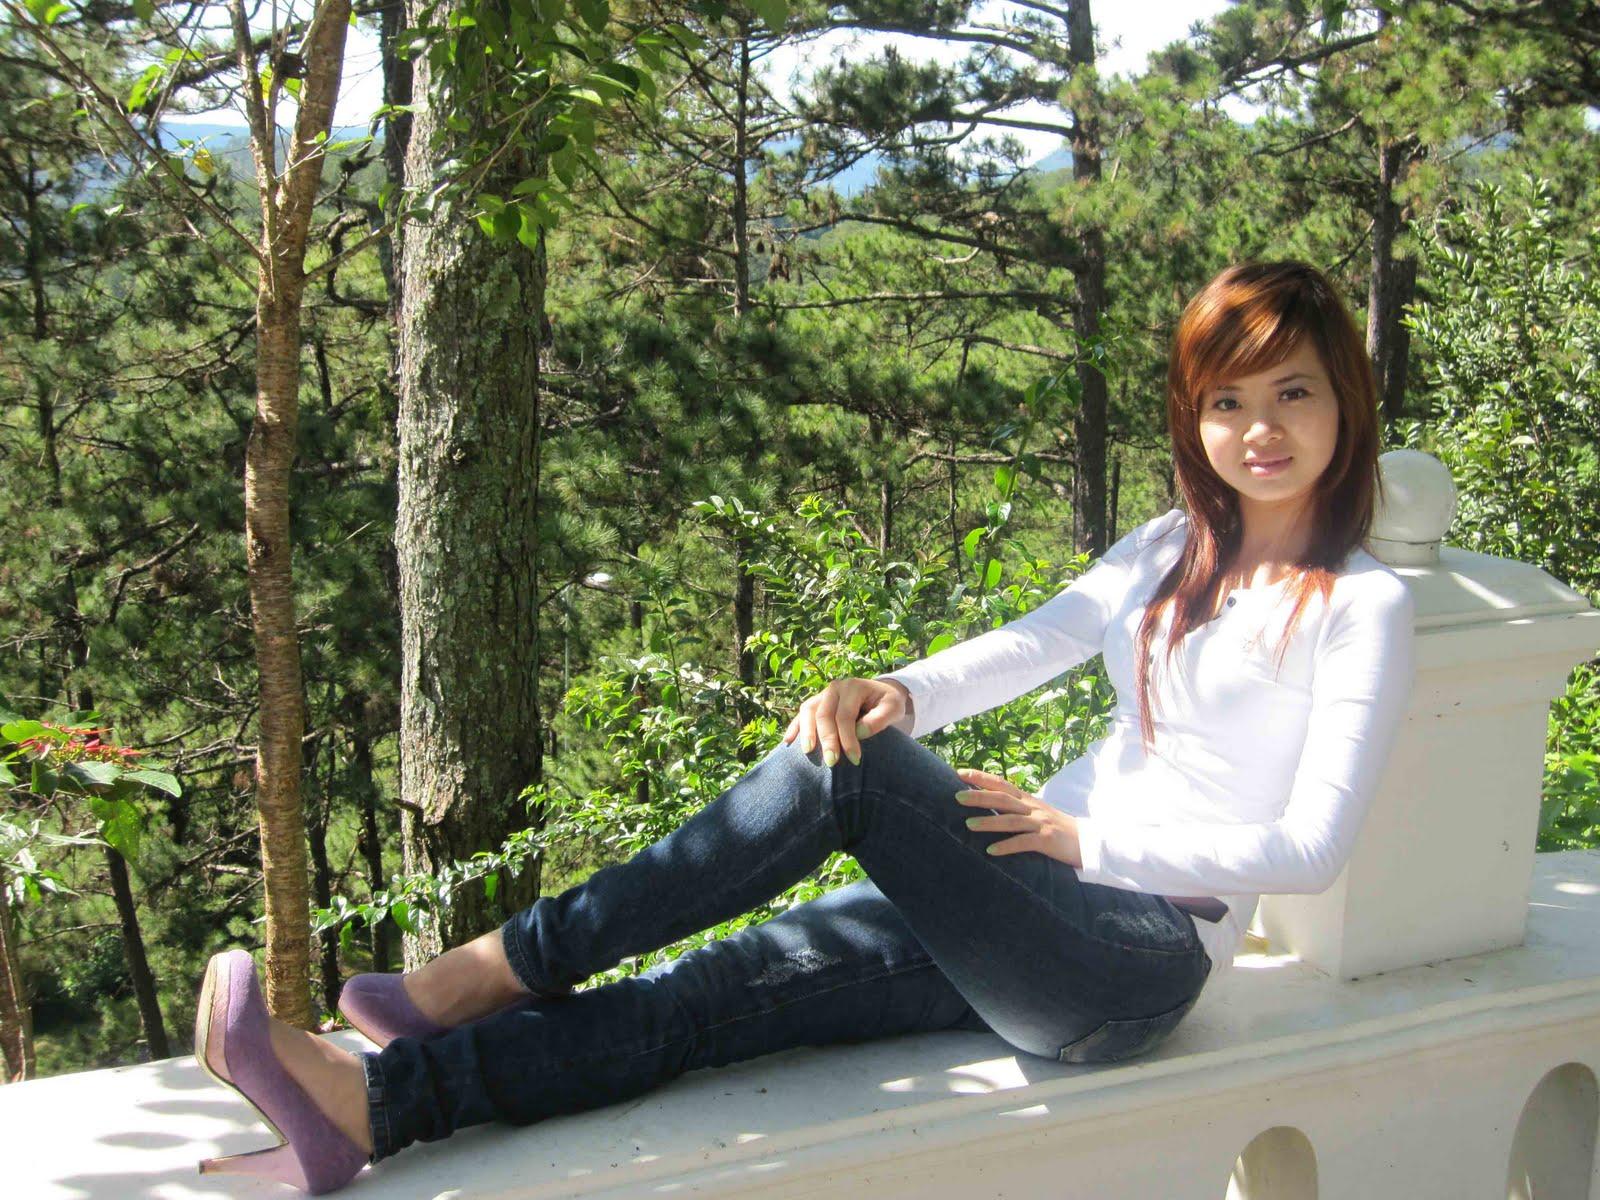 Pretty Girl Pictures - Vietnamese Girls-6691